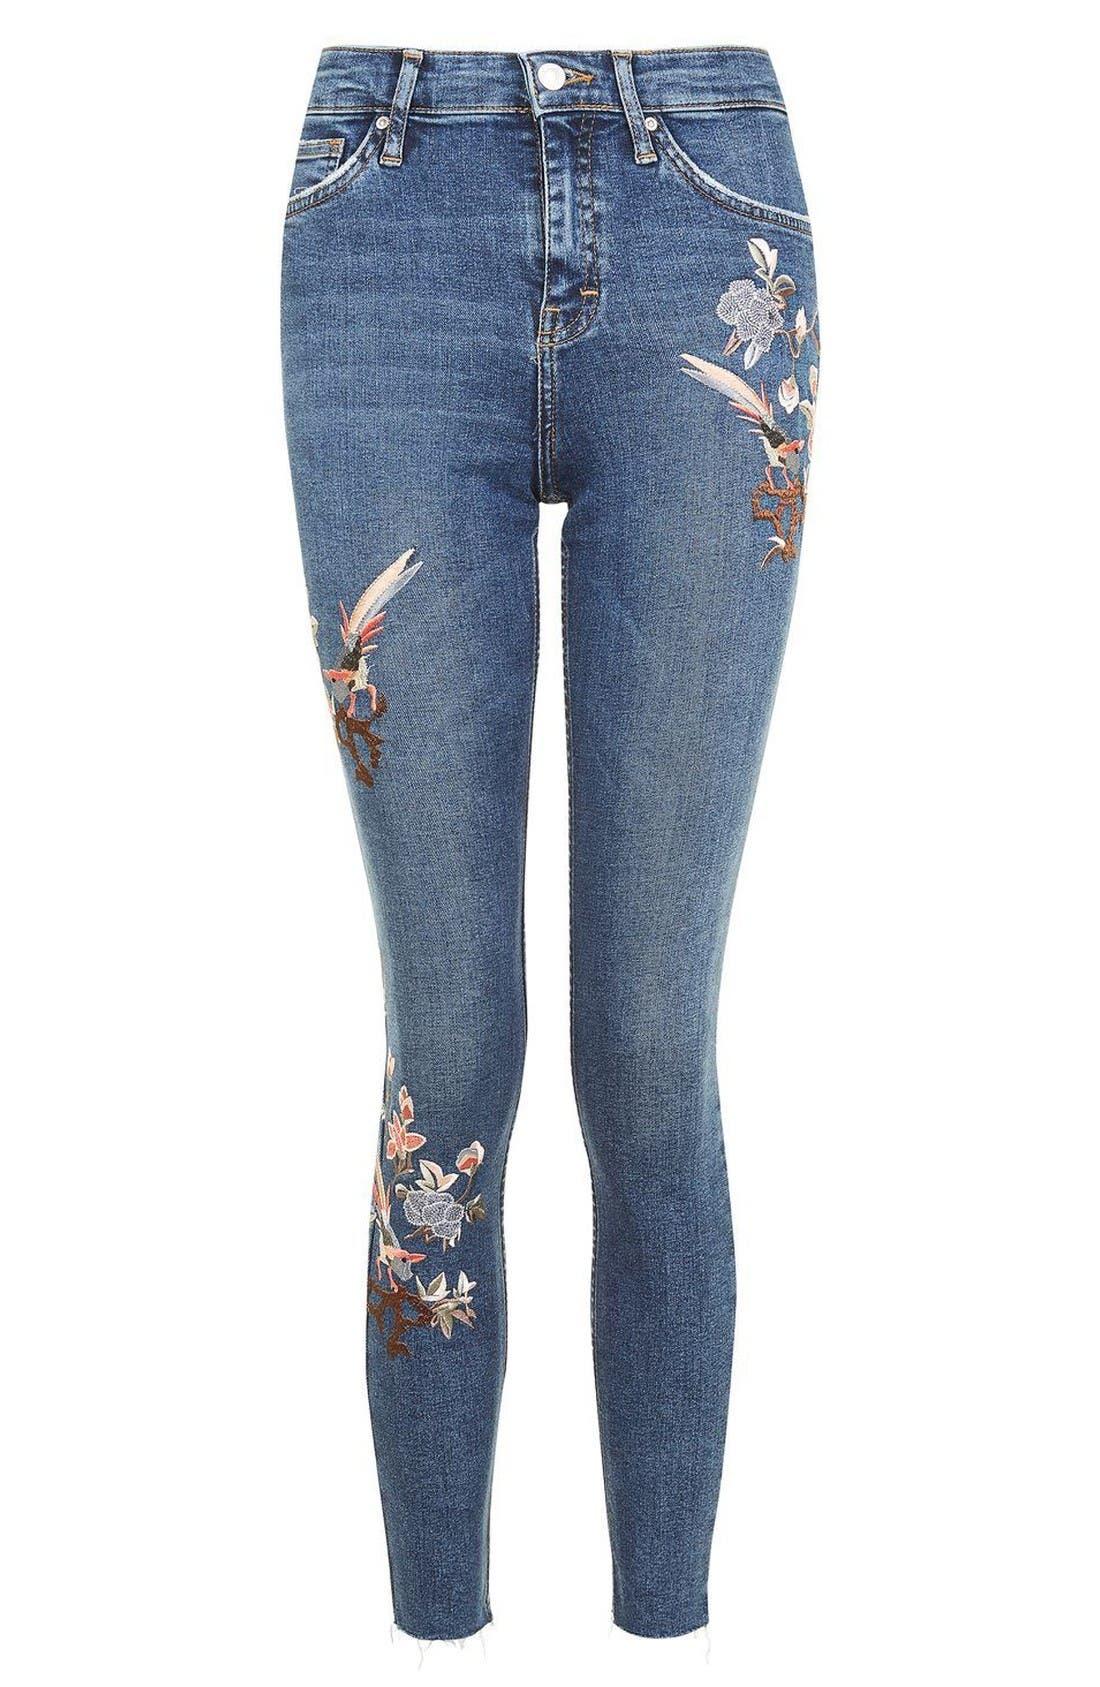 Moto Jamie Embroidered Skinny Jeans,                             Alternate thumbnail 4, color,                             Mid Denim